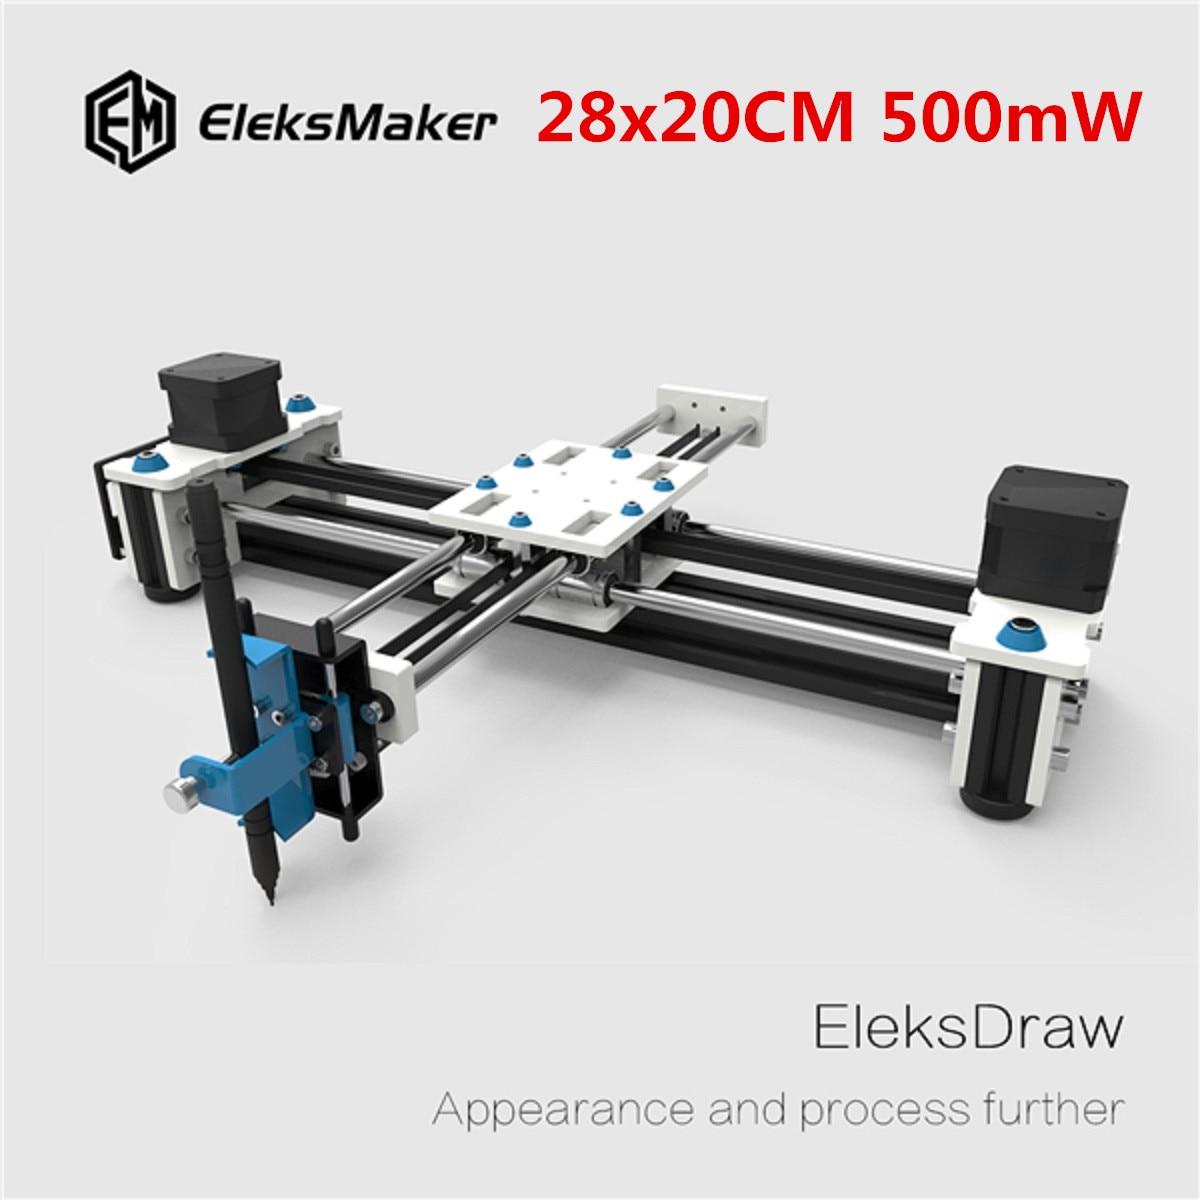 EleksMaker EleksDraw 500mW Mini XY 2 Axis CNC DIY Laser Drawing Machine kam xy laser rbp